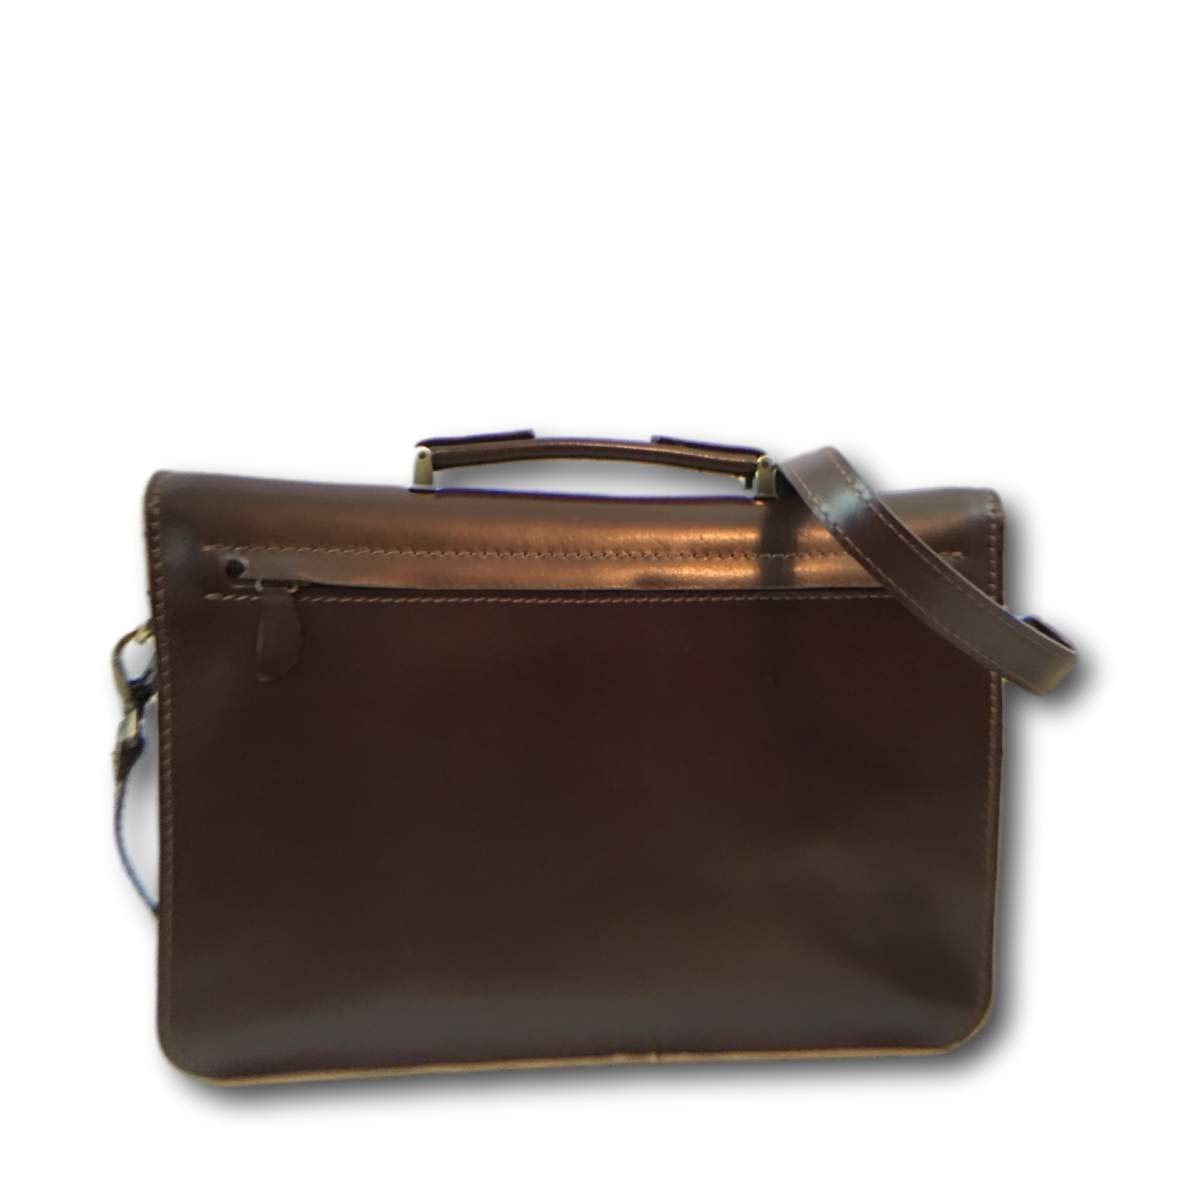 Zawadee Makeba Walnut Brown Leather Messenger Bag